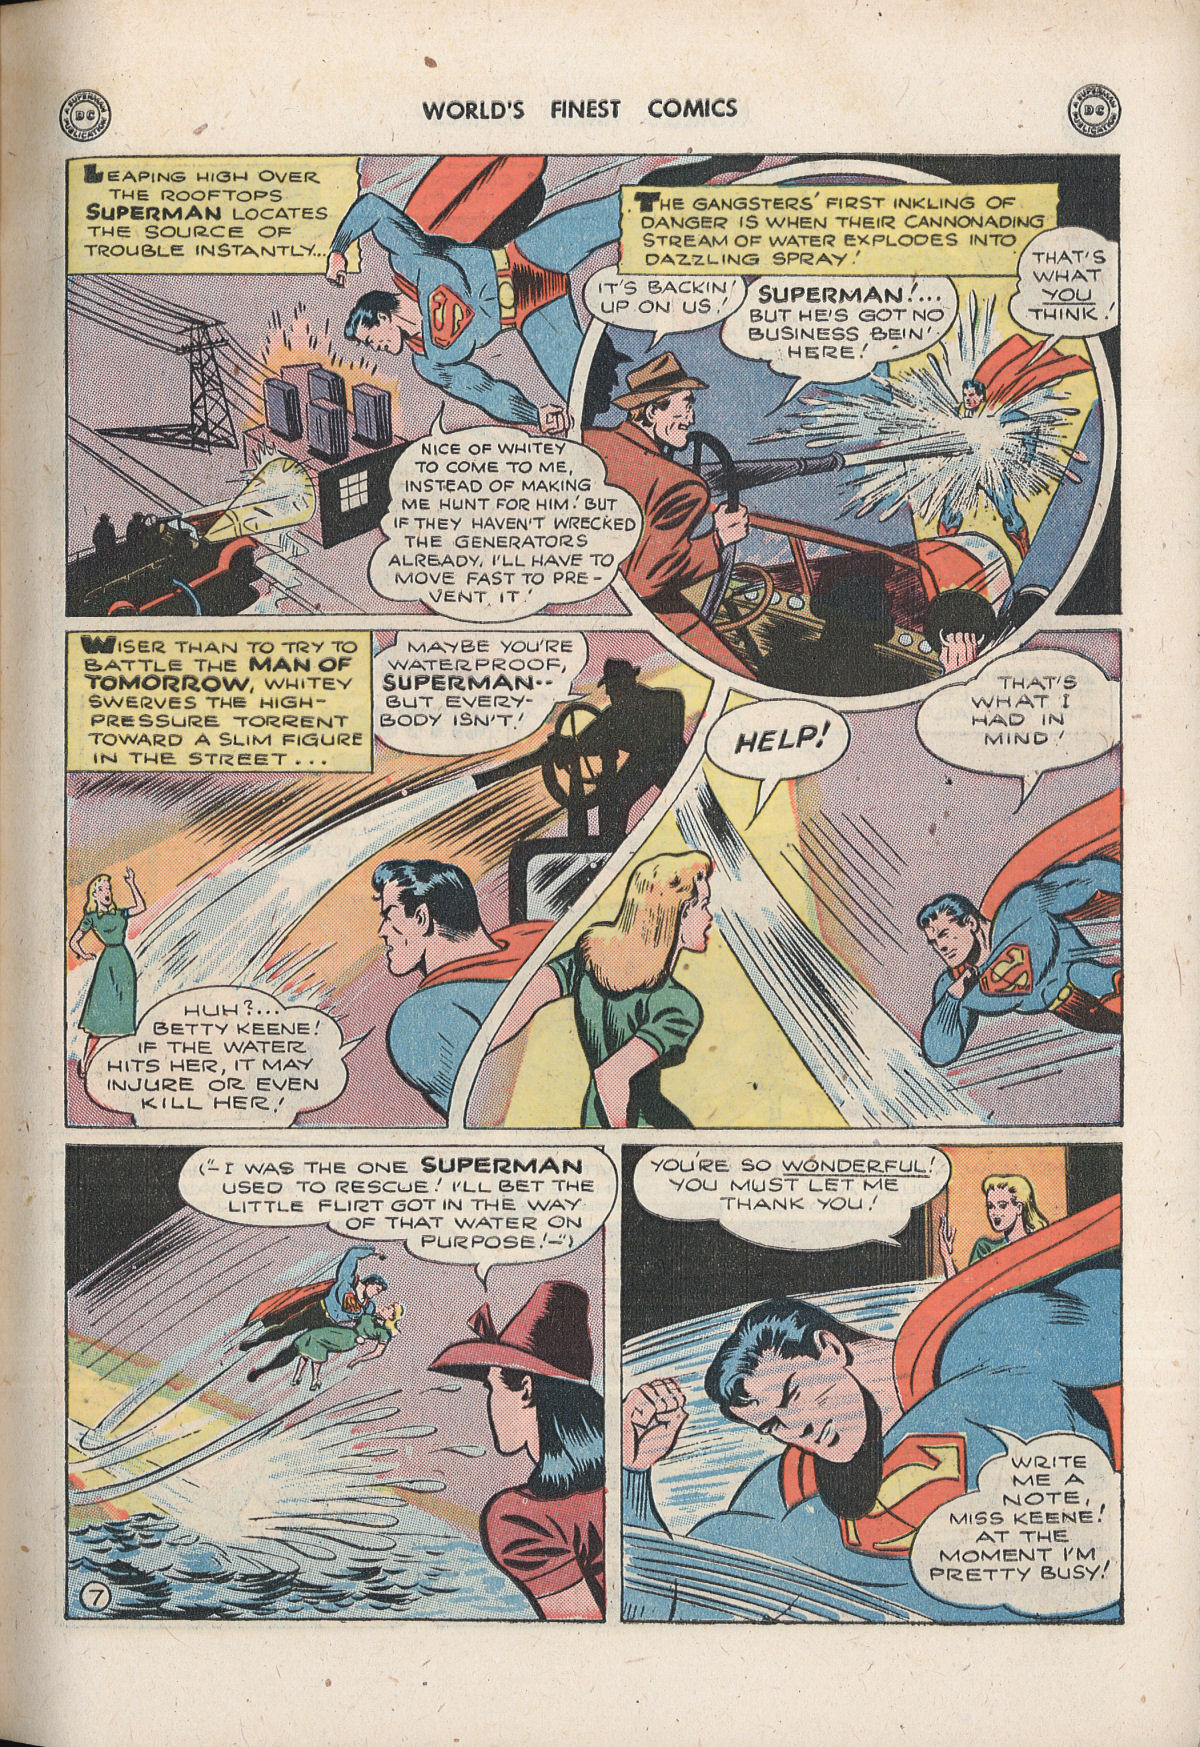 Read online World's Finest Comics comic -  Issue #33 - 9